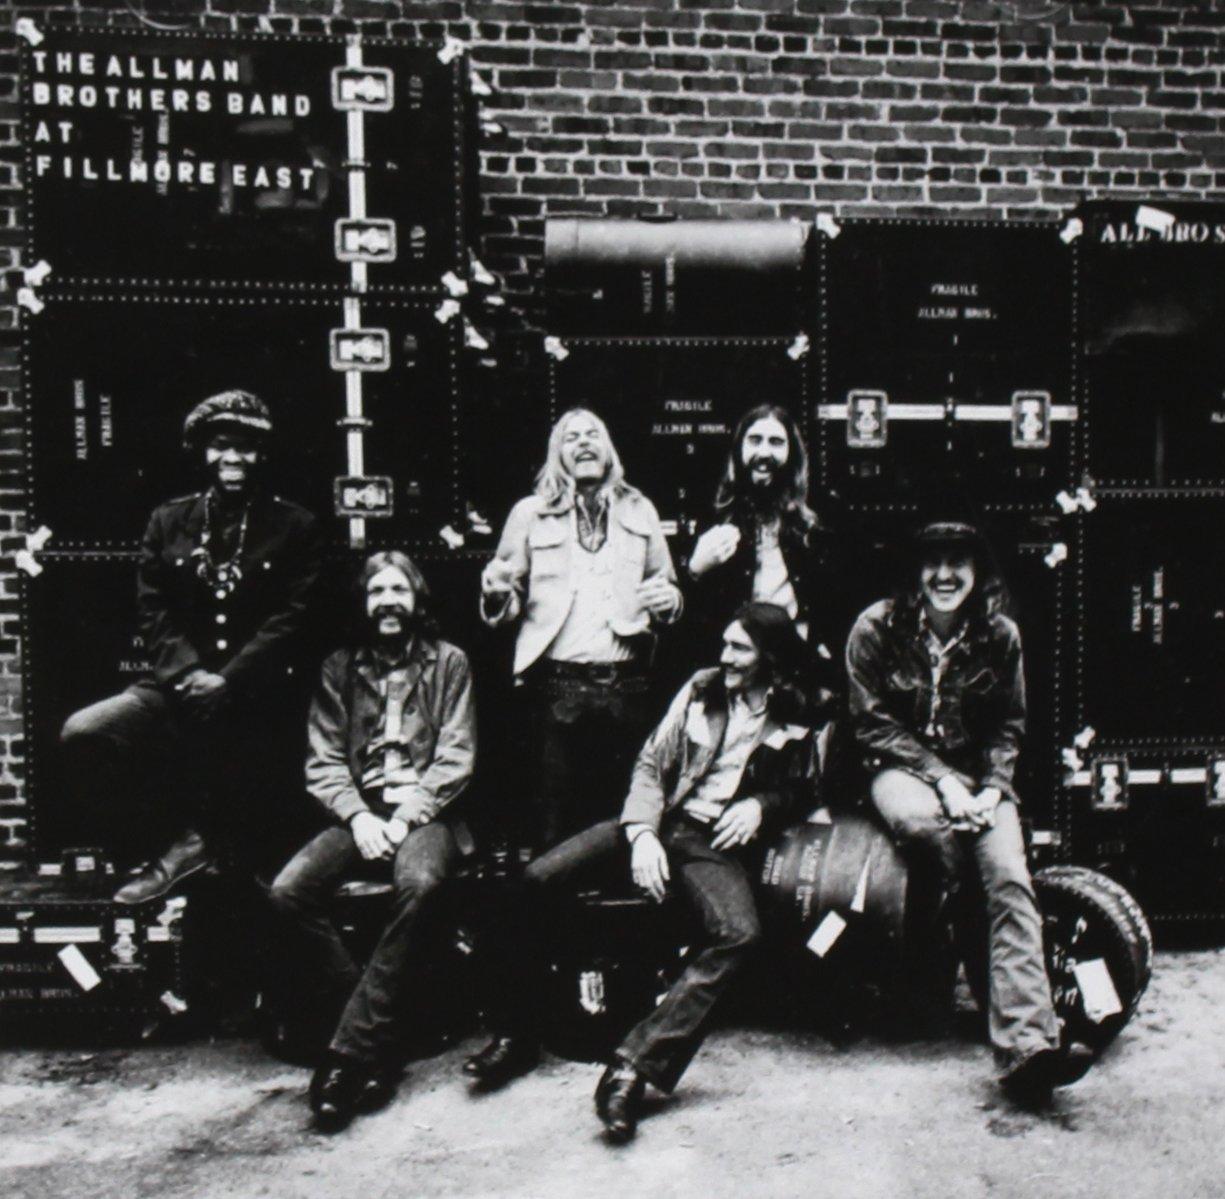 'At Fillmore...' - The Allman Brothers Band: